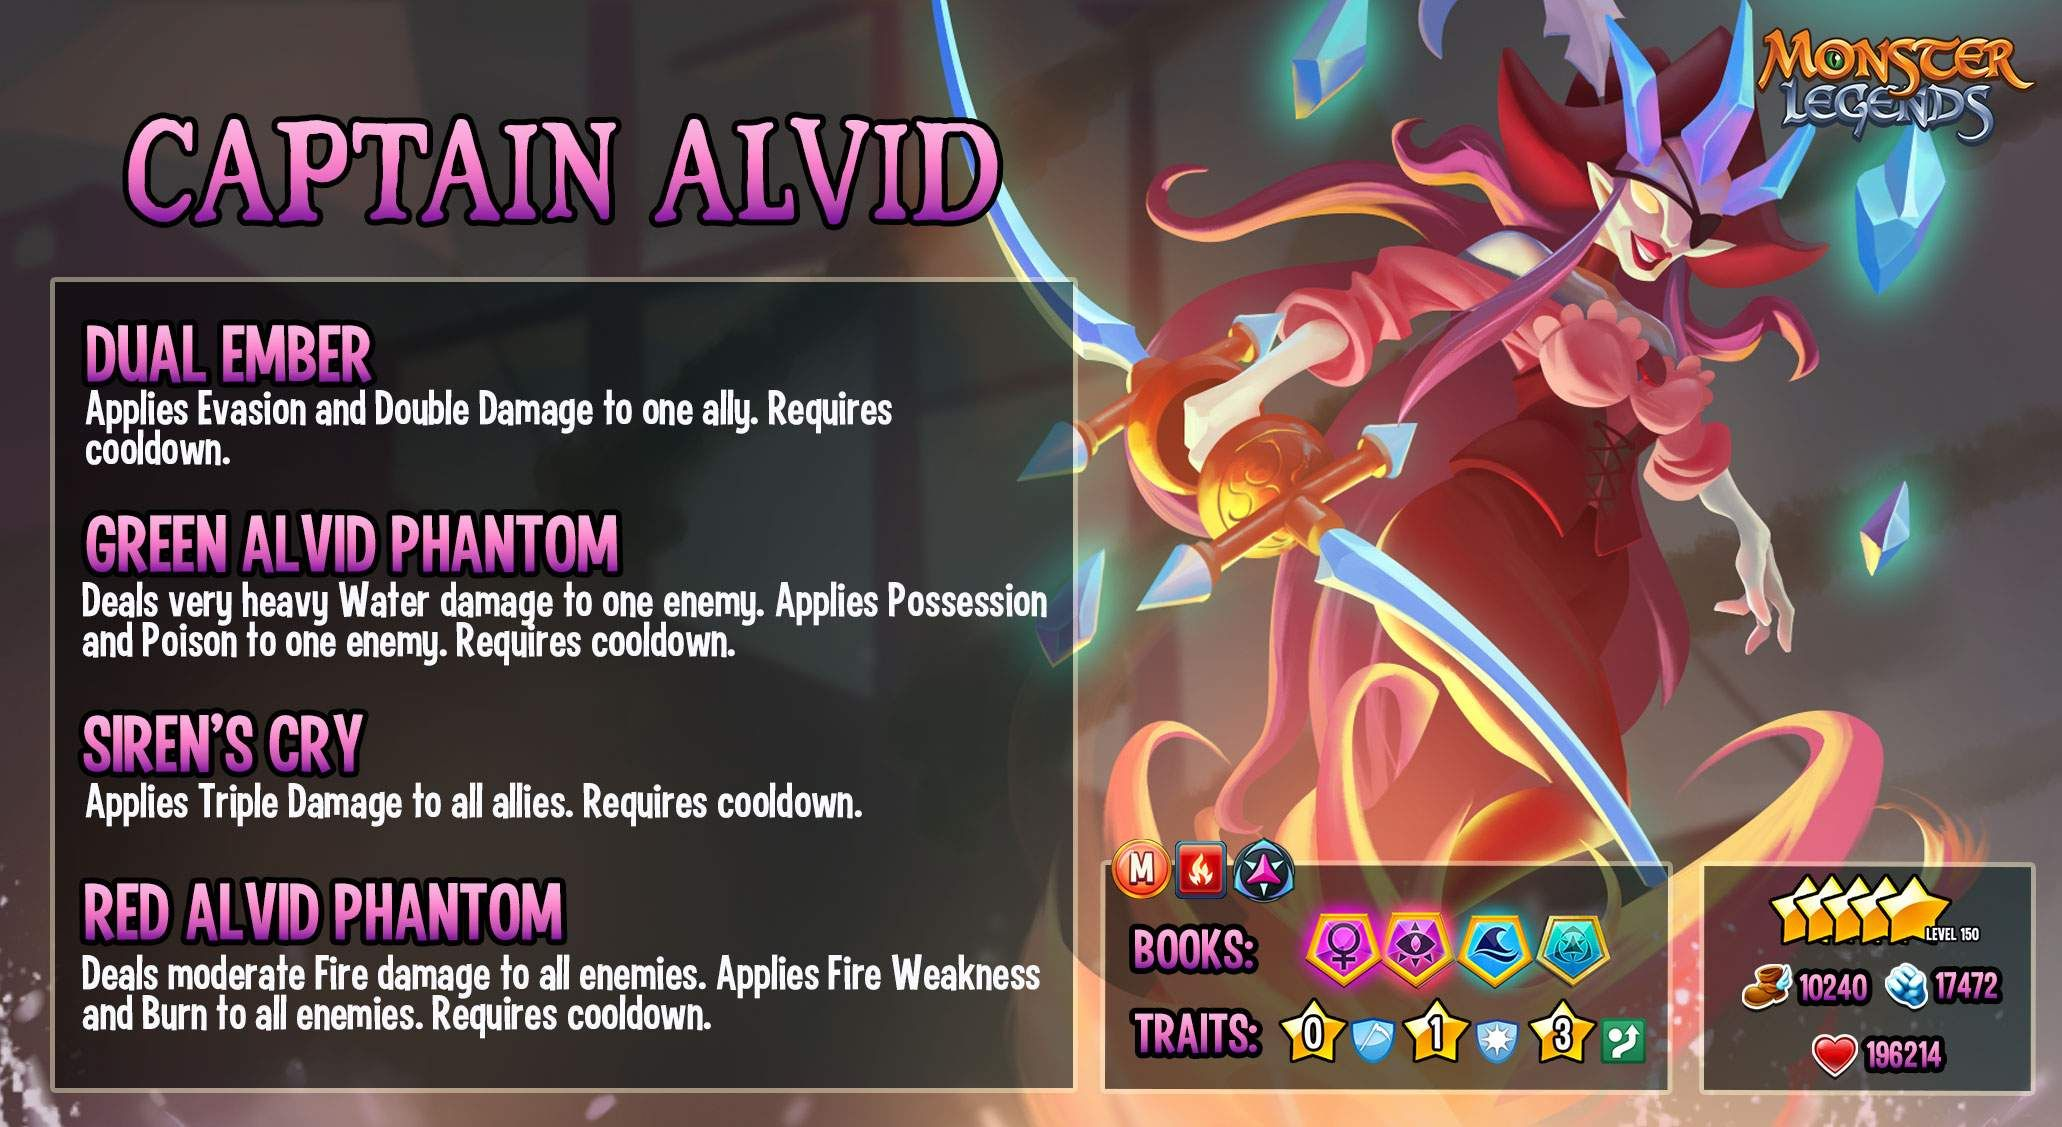 0_1611647762251_Captain-Alvid.jpg